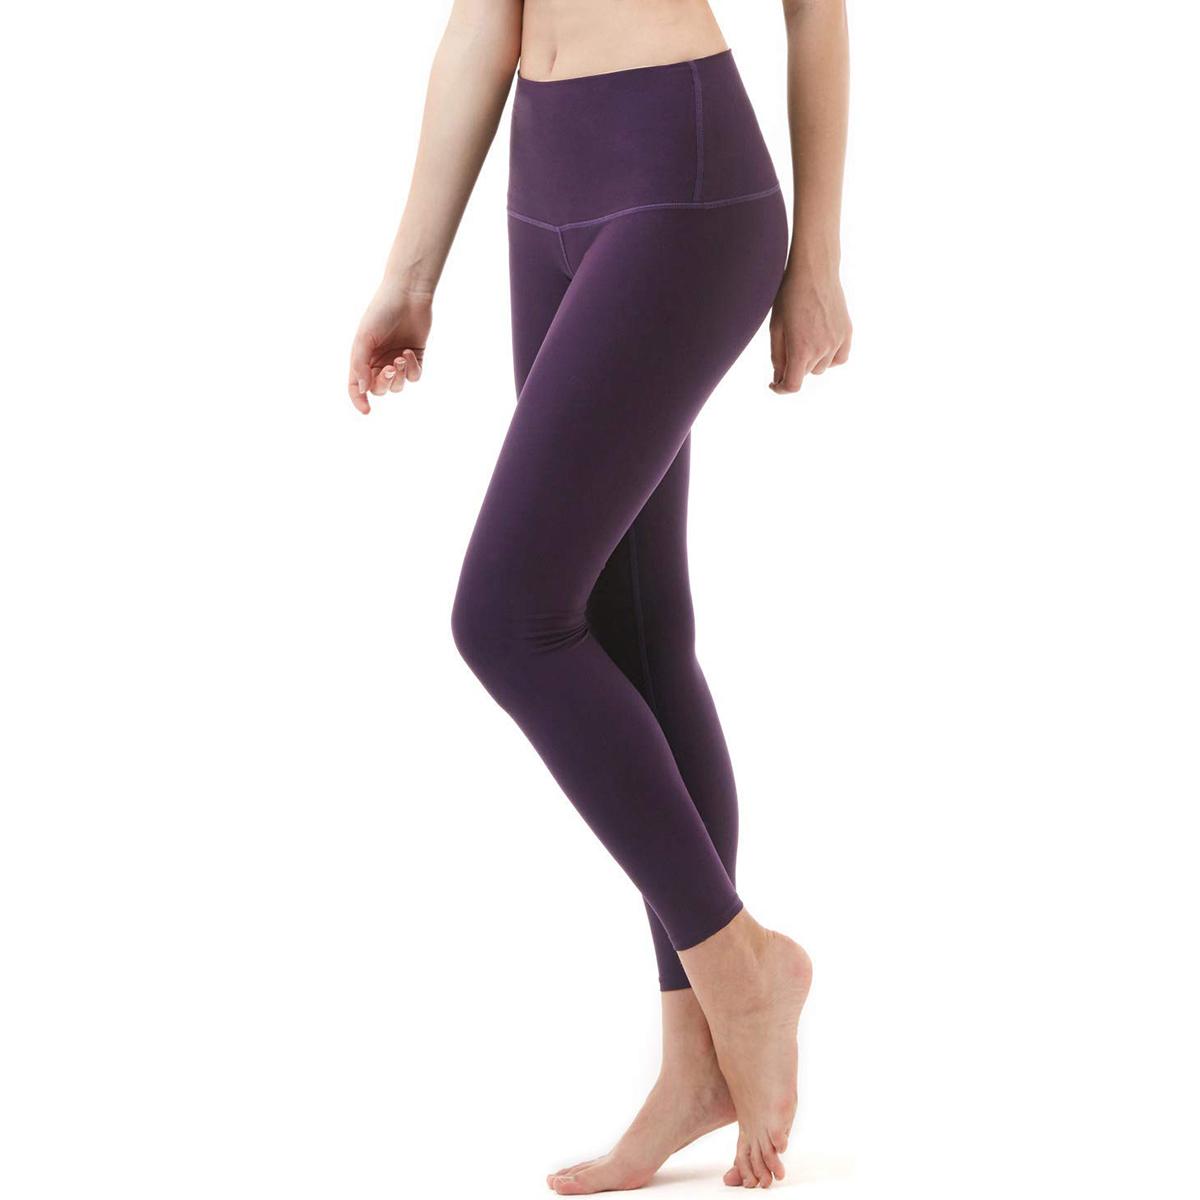 thumbnail 22 - TSLA Tesla FYP52 Women's High-Waisted Ultra-Stretch Tummy Control Yoga Pants